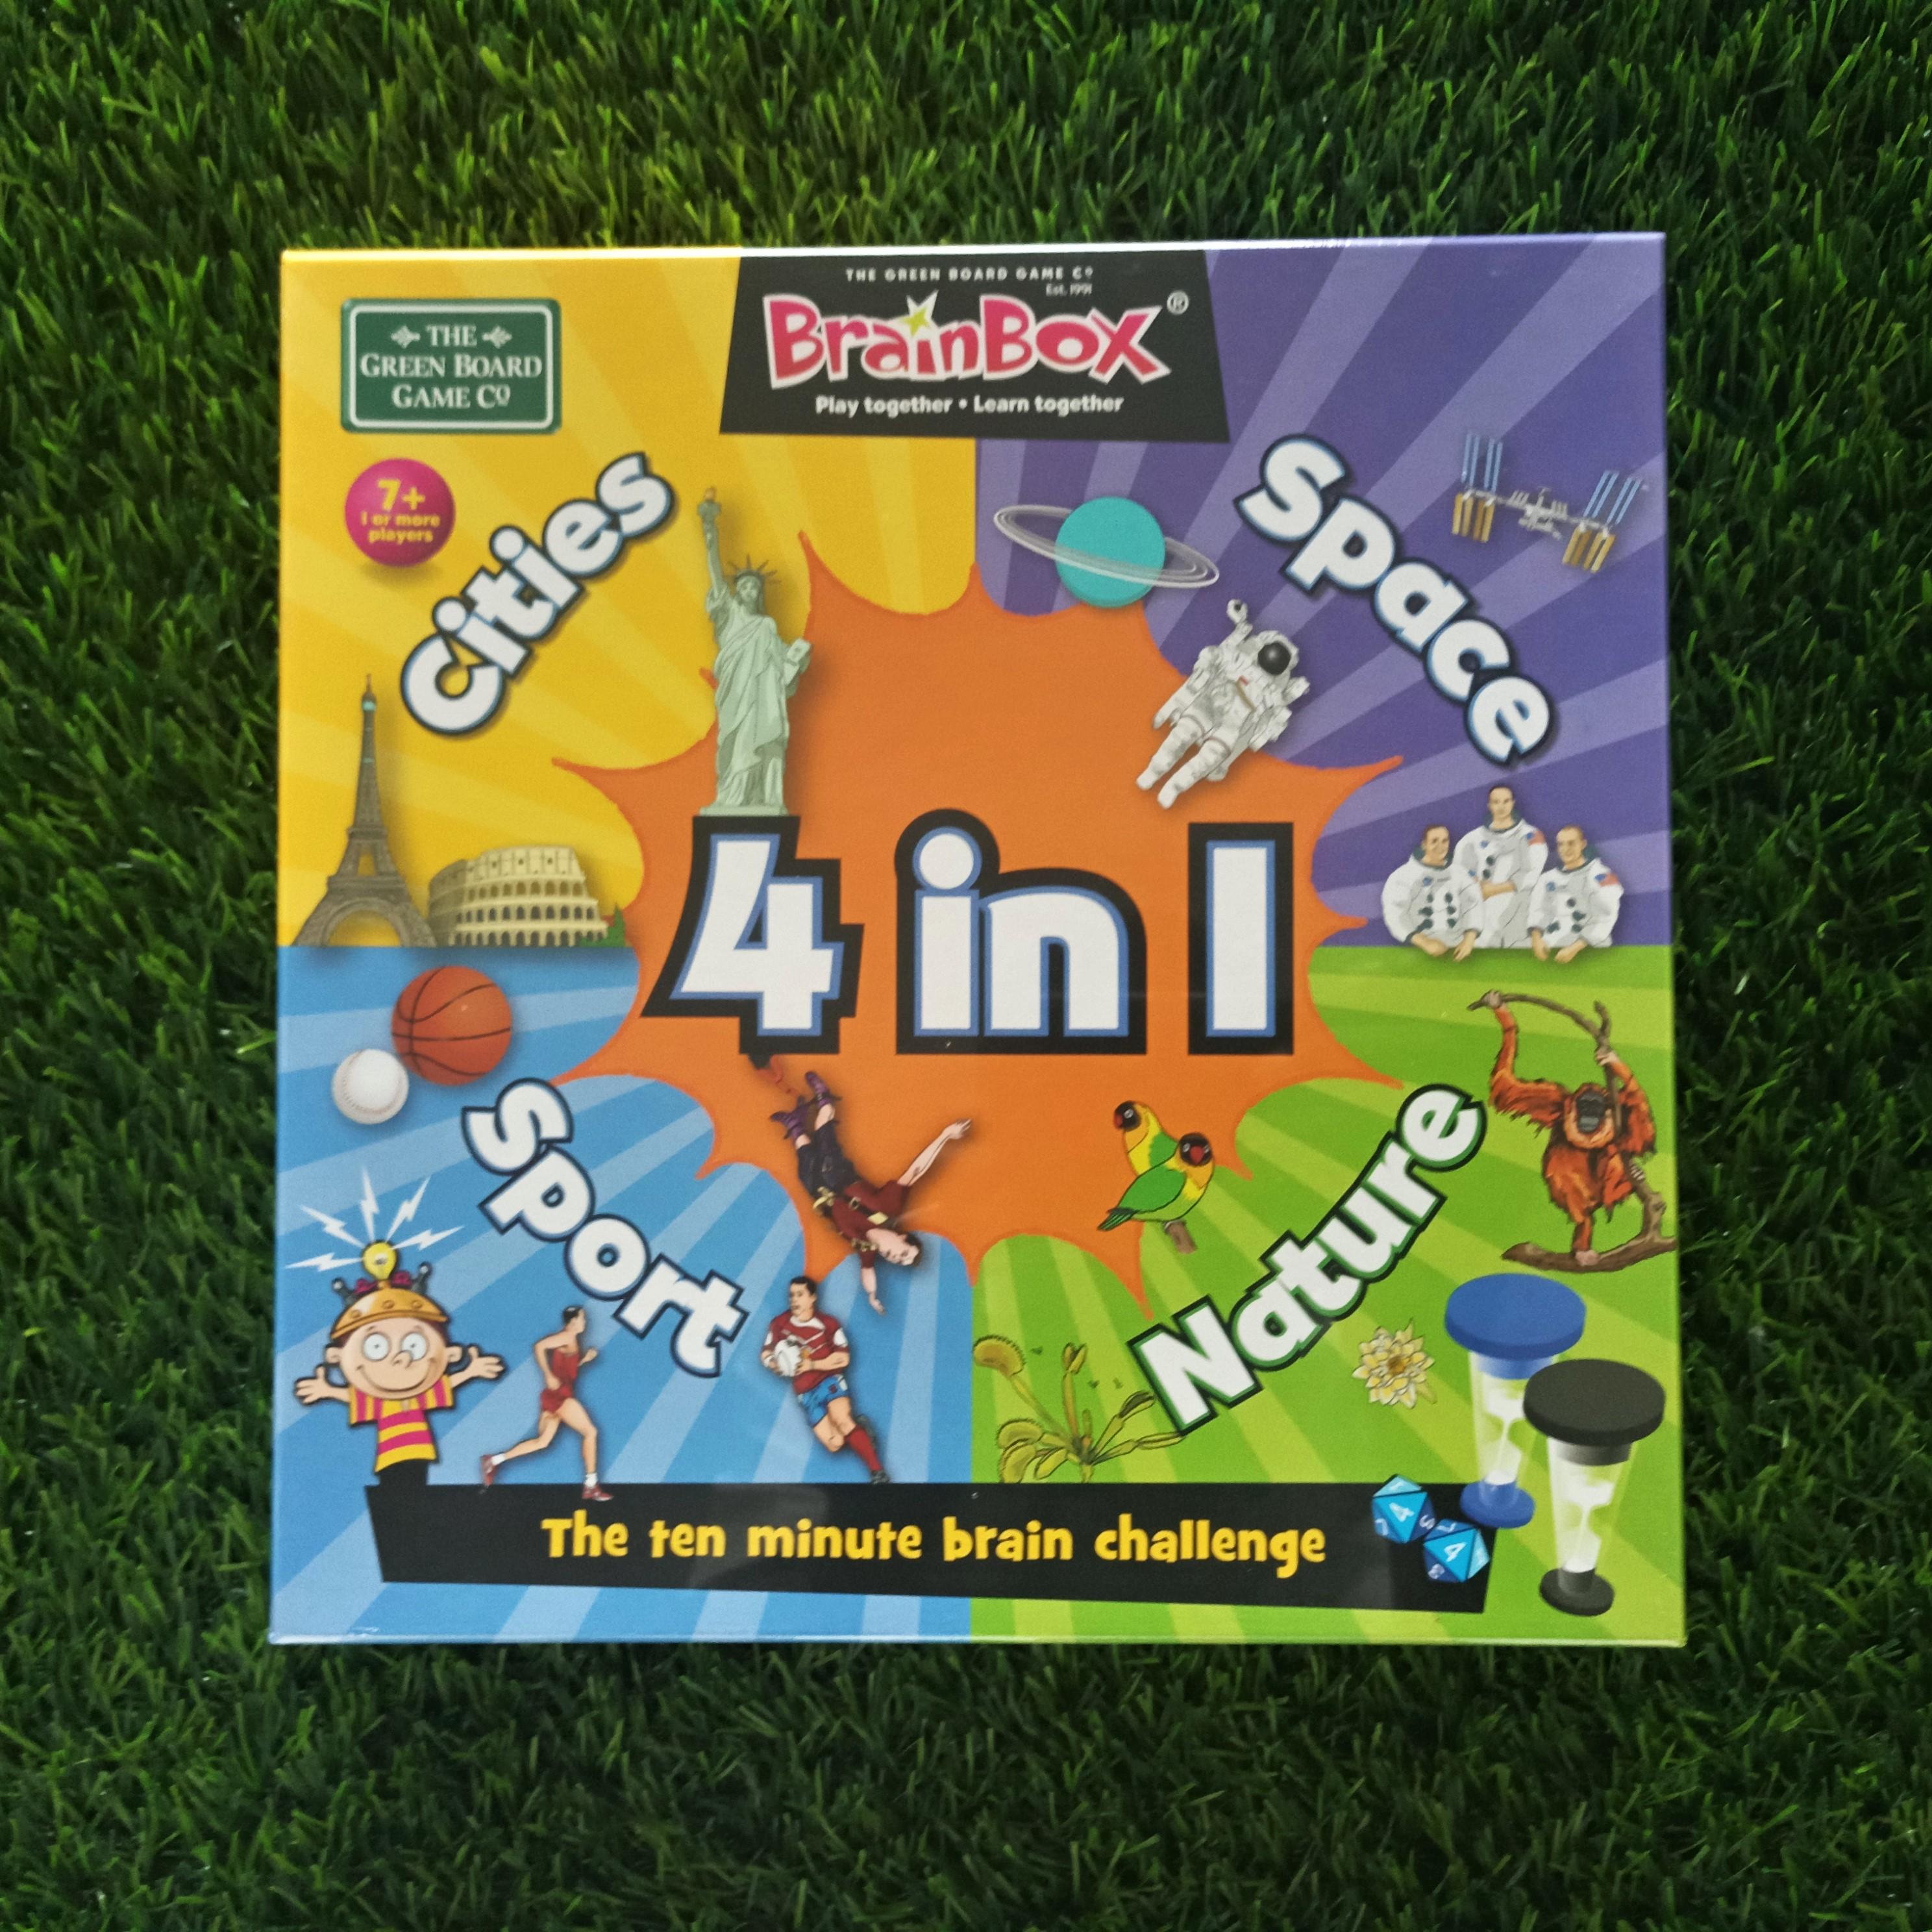 The Green Board Game Brain box 4 in 1